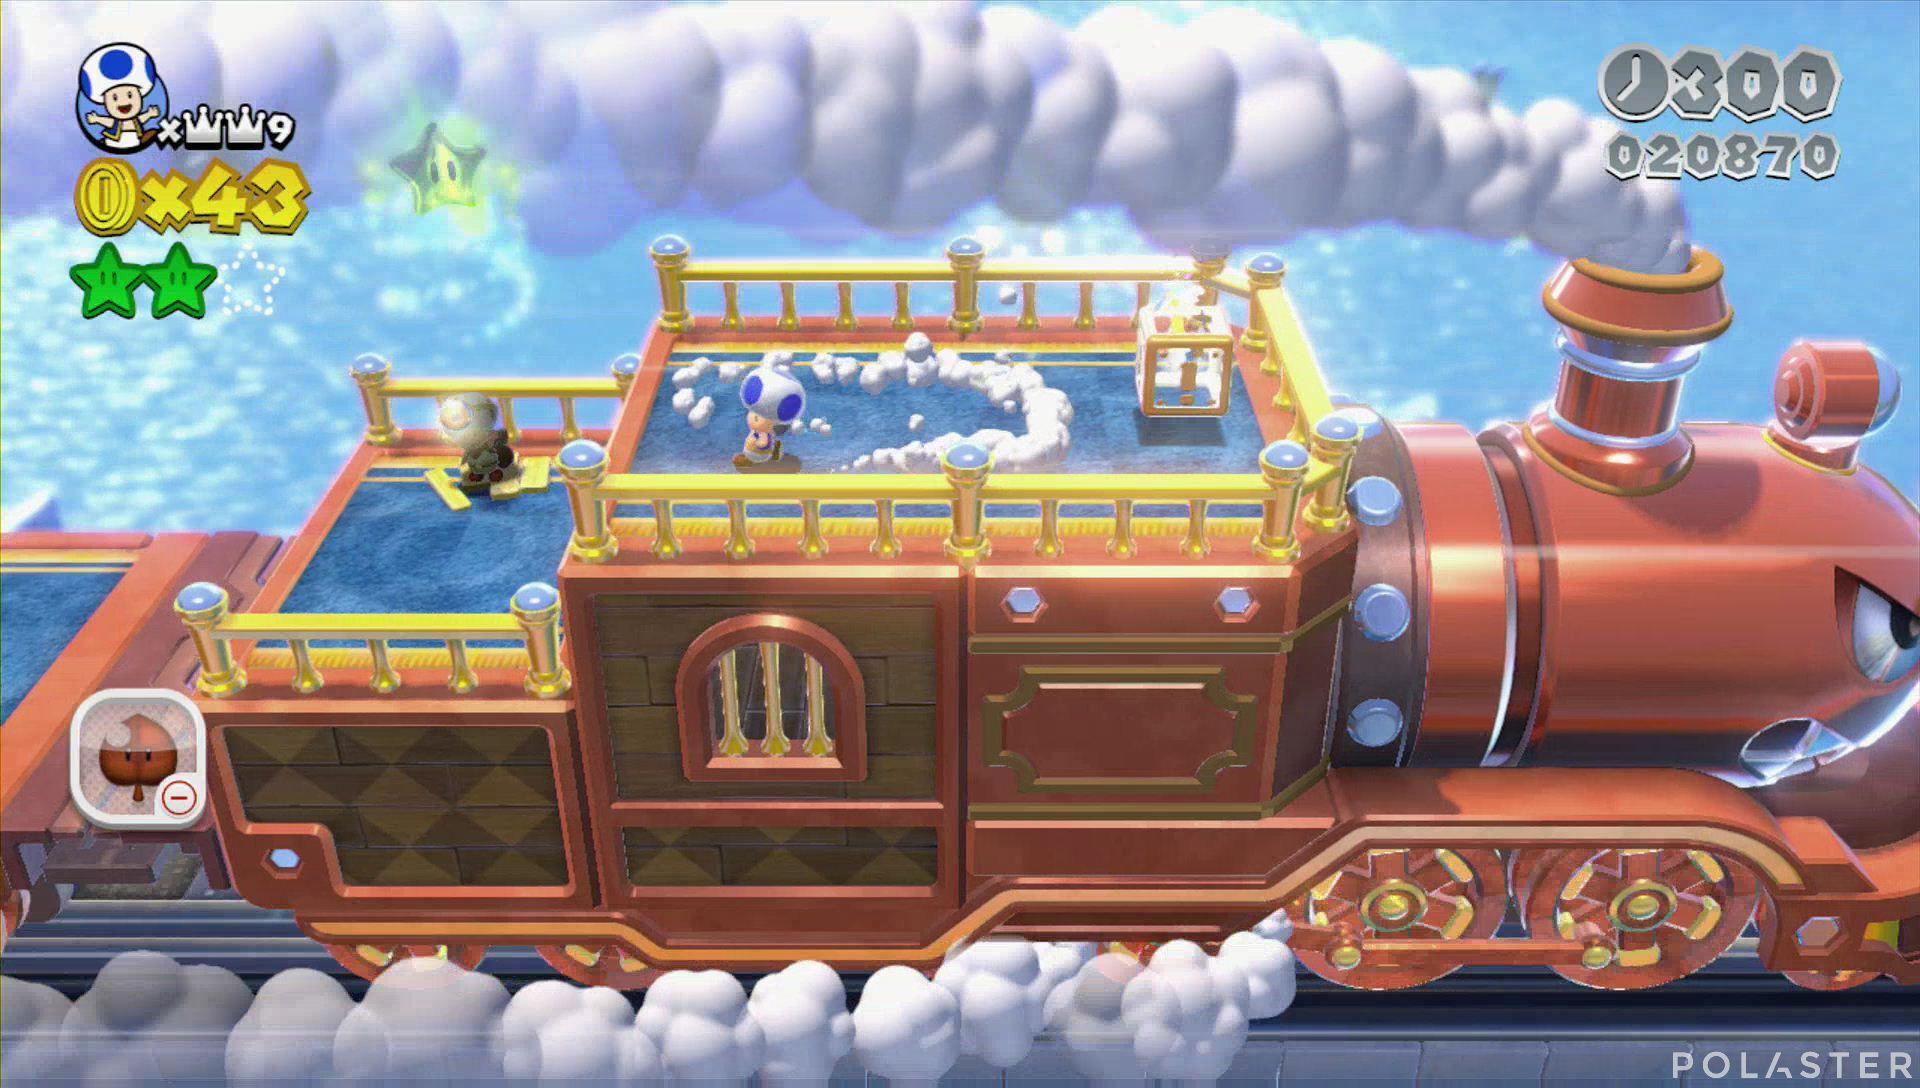 Super Mario 3D World Mundo 3-Castillo Estrella 3